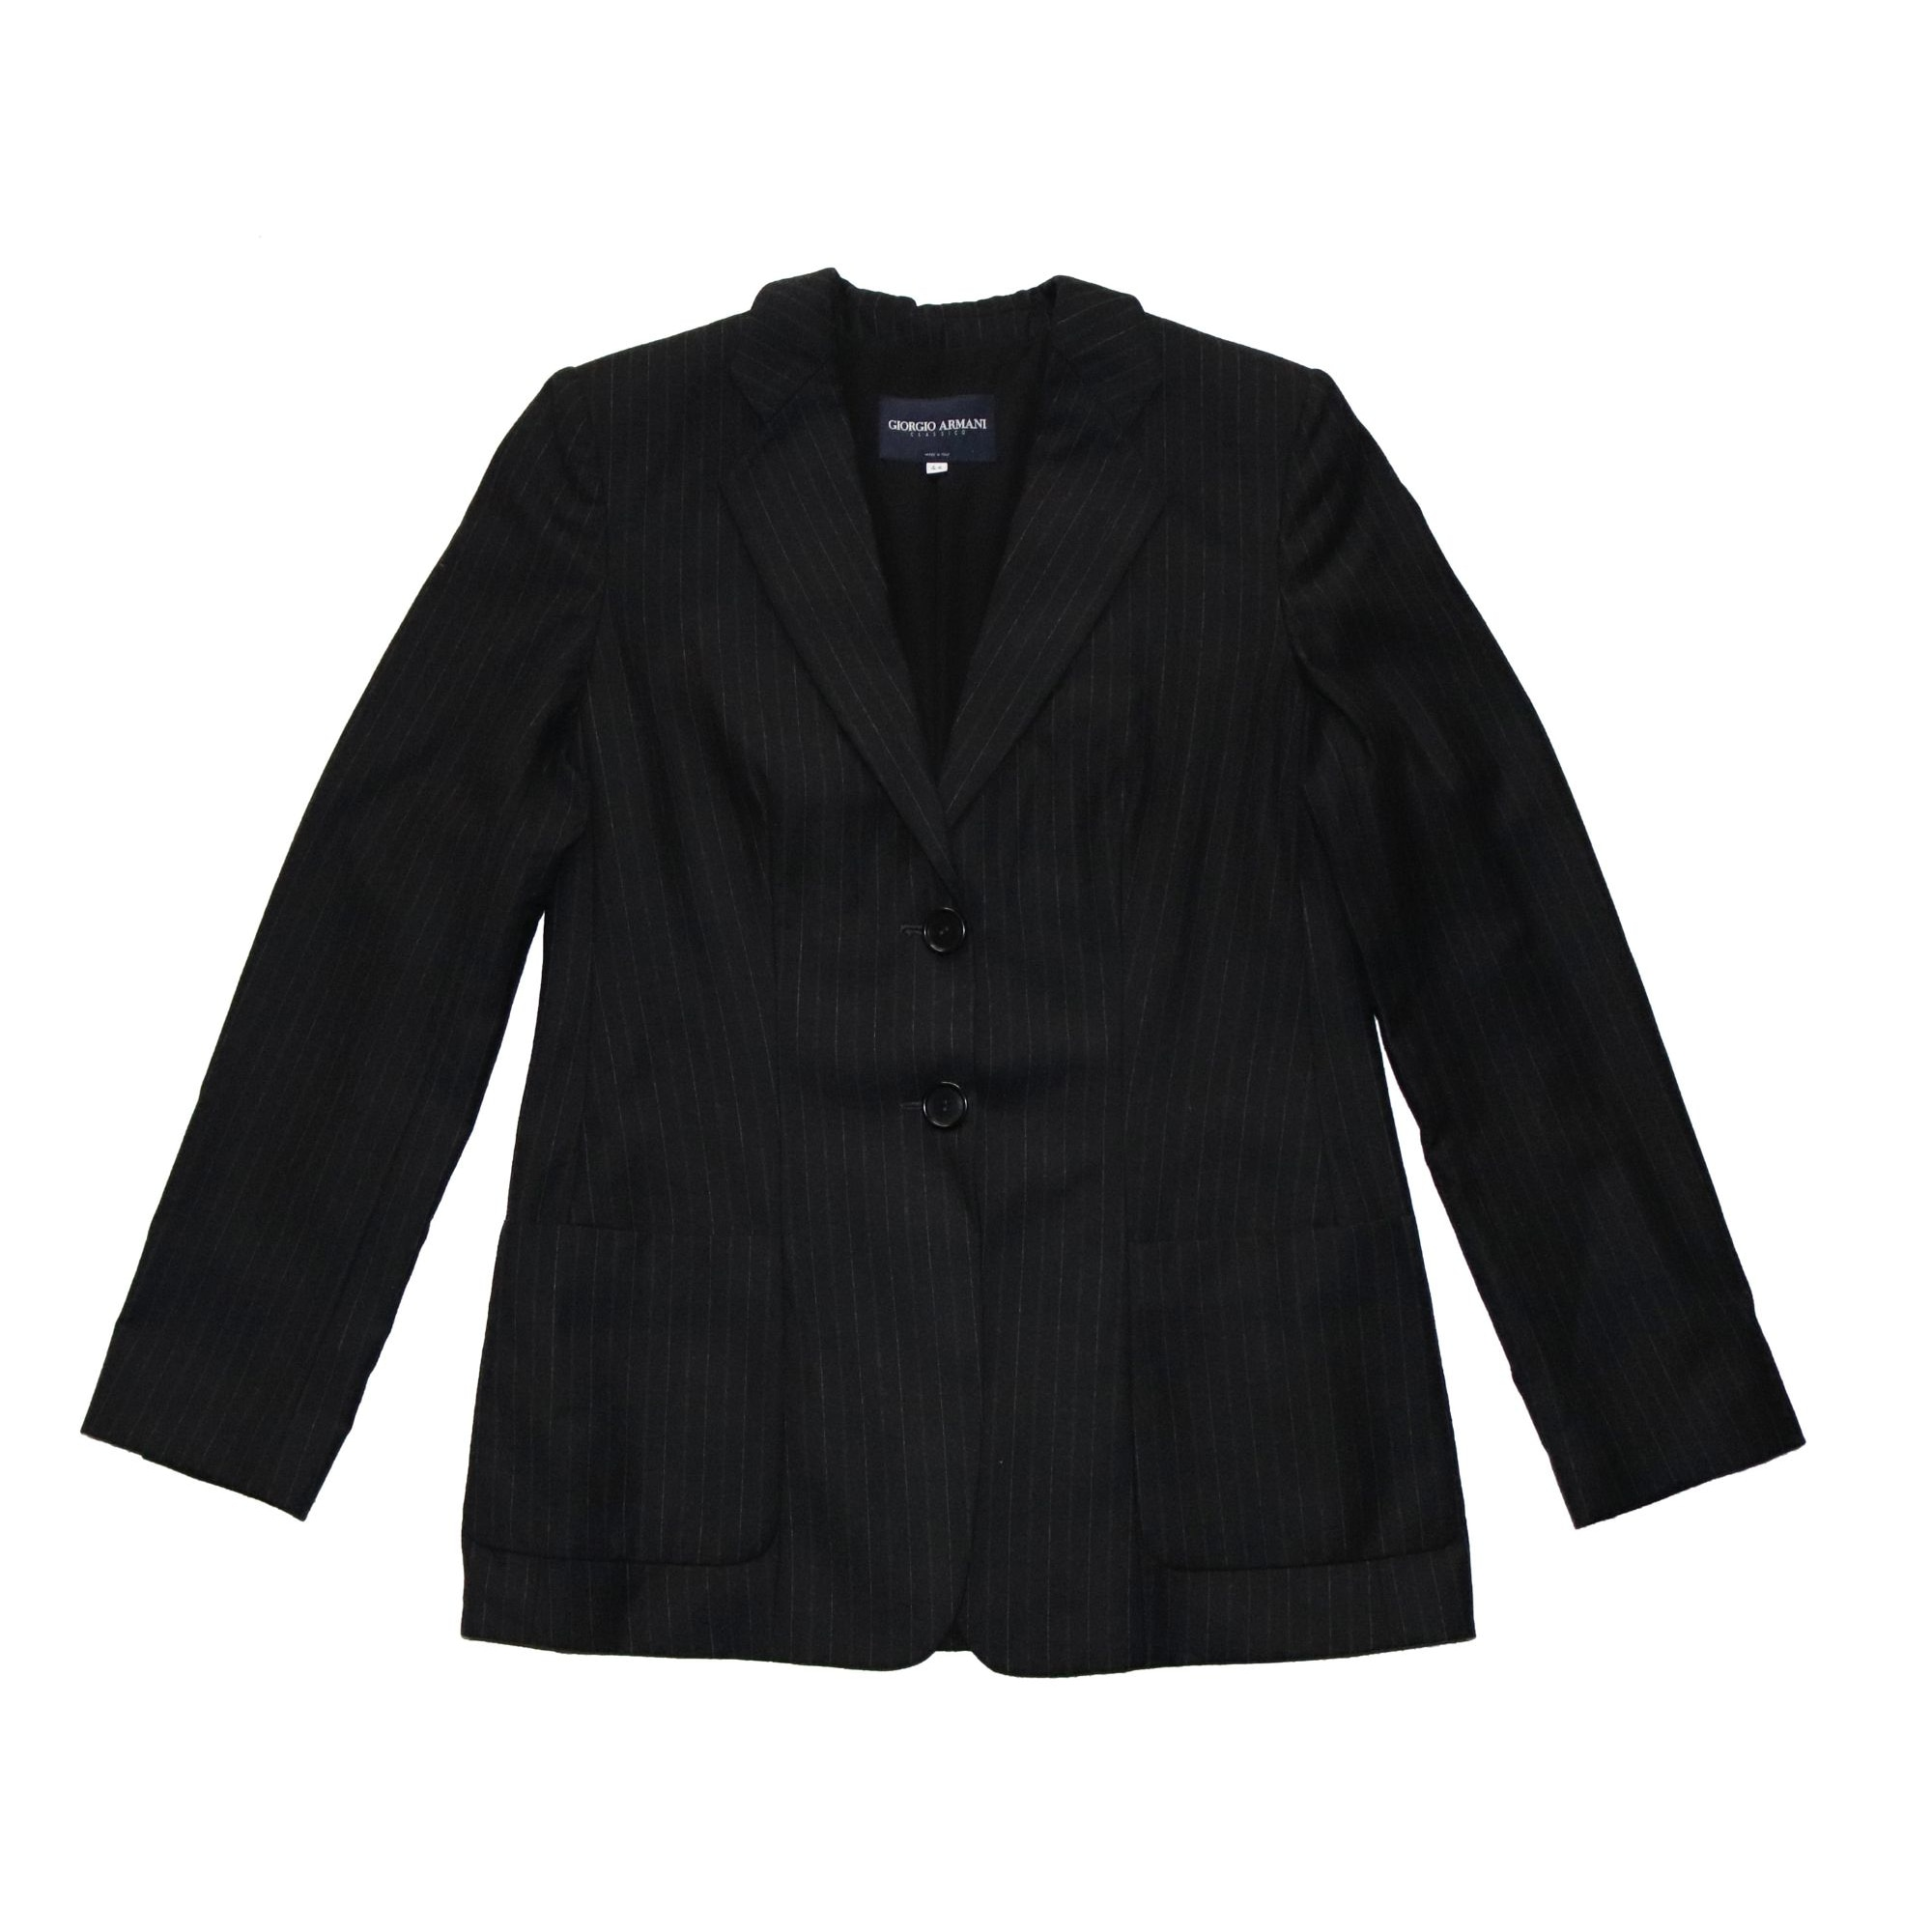 Blazer, veste tailleur GIORGIO ARMANI Gris, anthracite